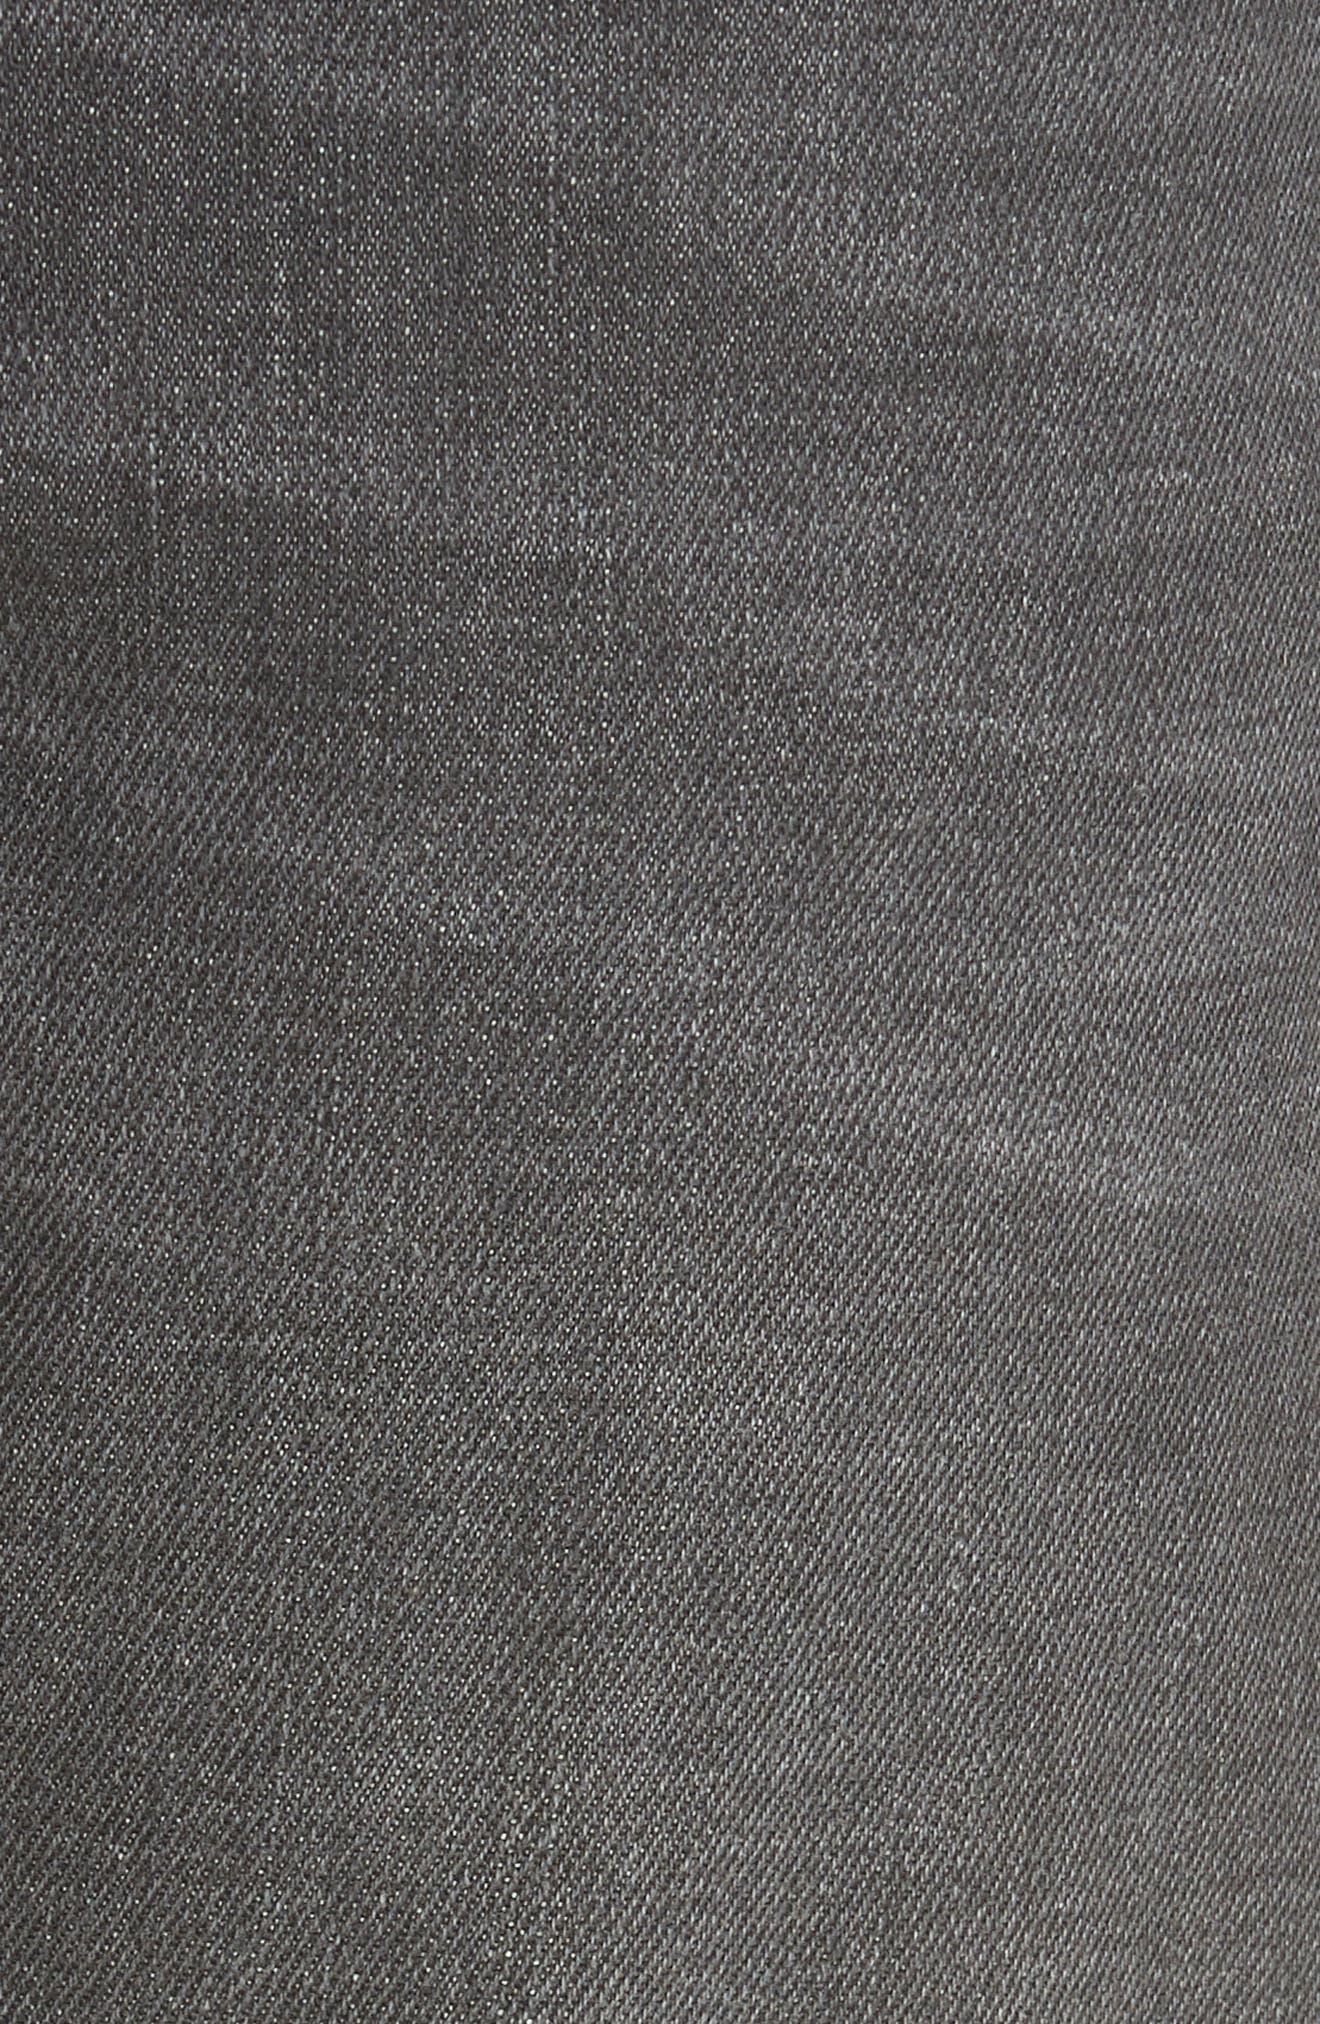 VERSACE COLLECTION,                             Medusa Pocket Jeans,                             Alternate thumbnail 5, color,                             020